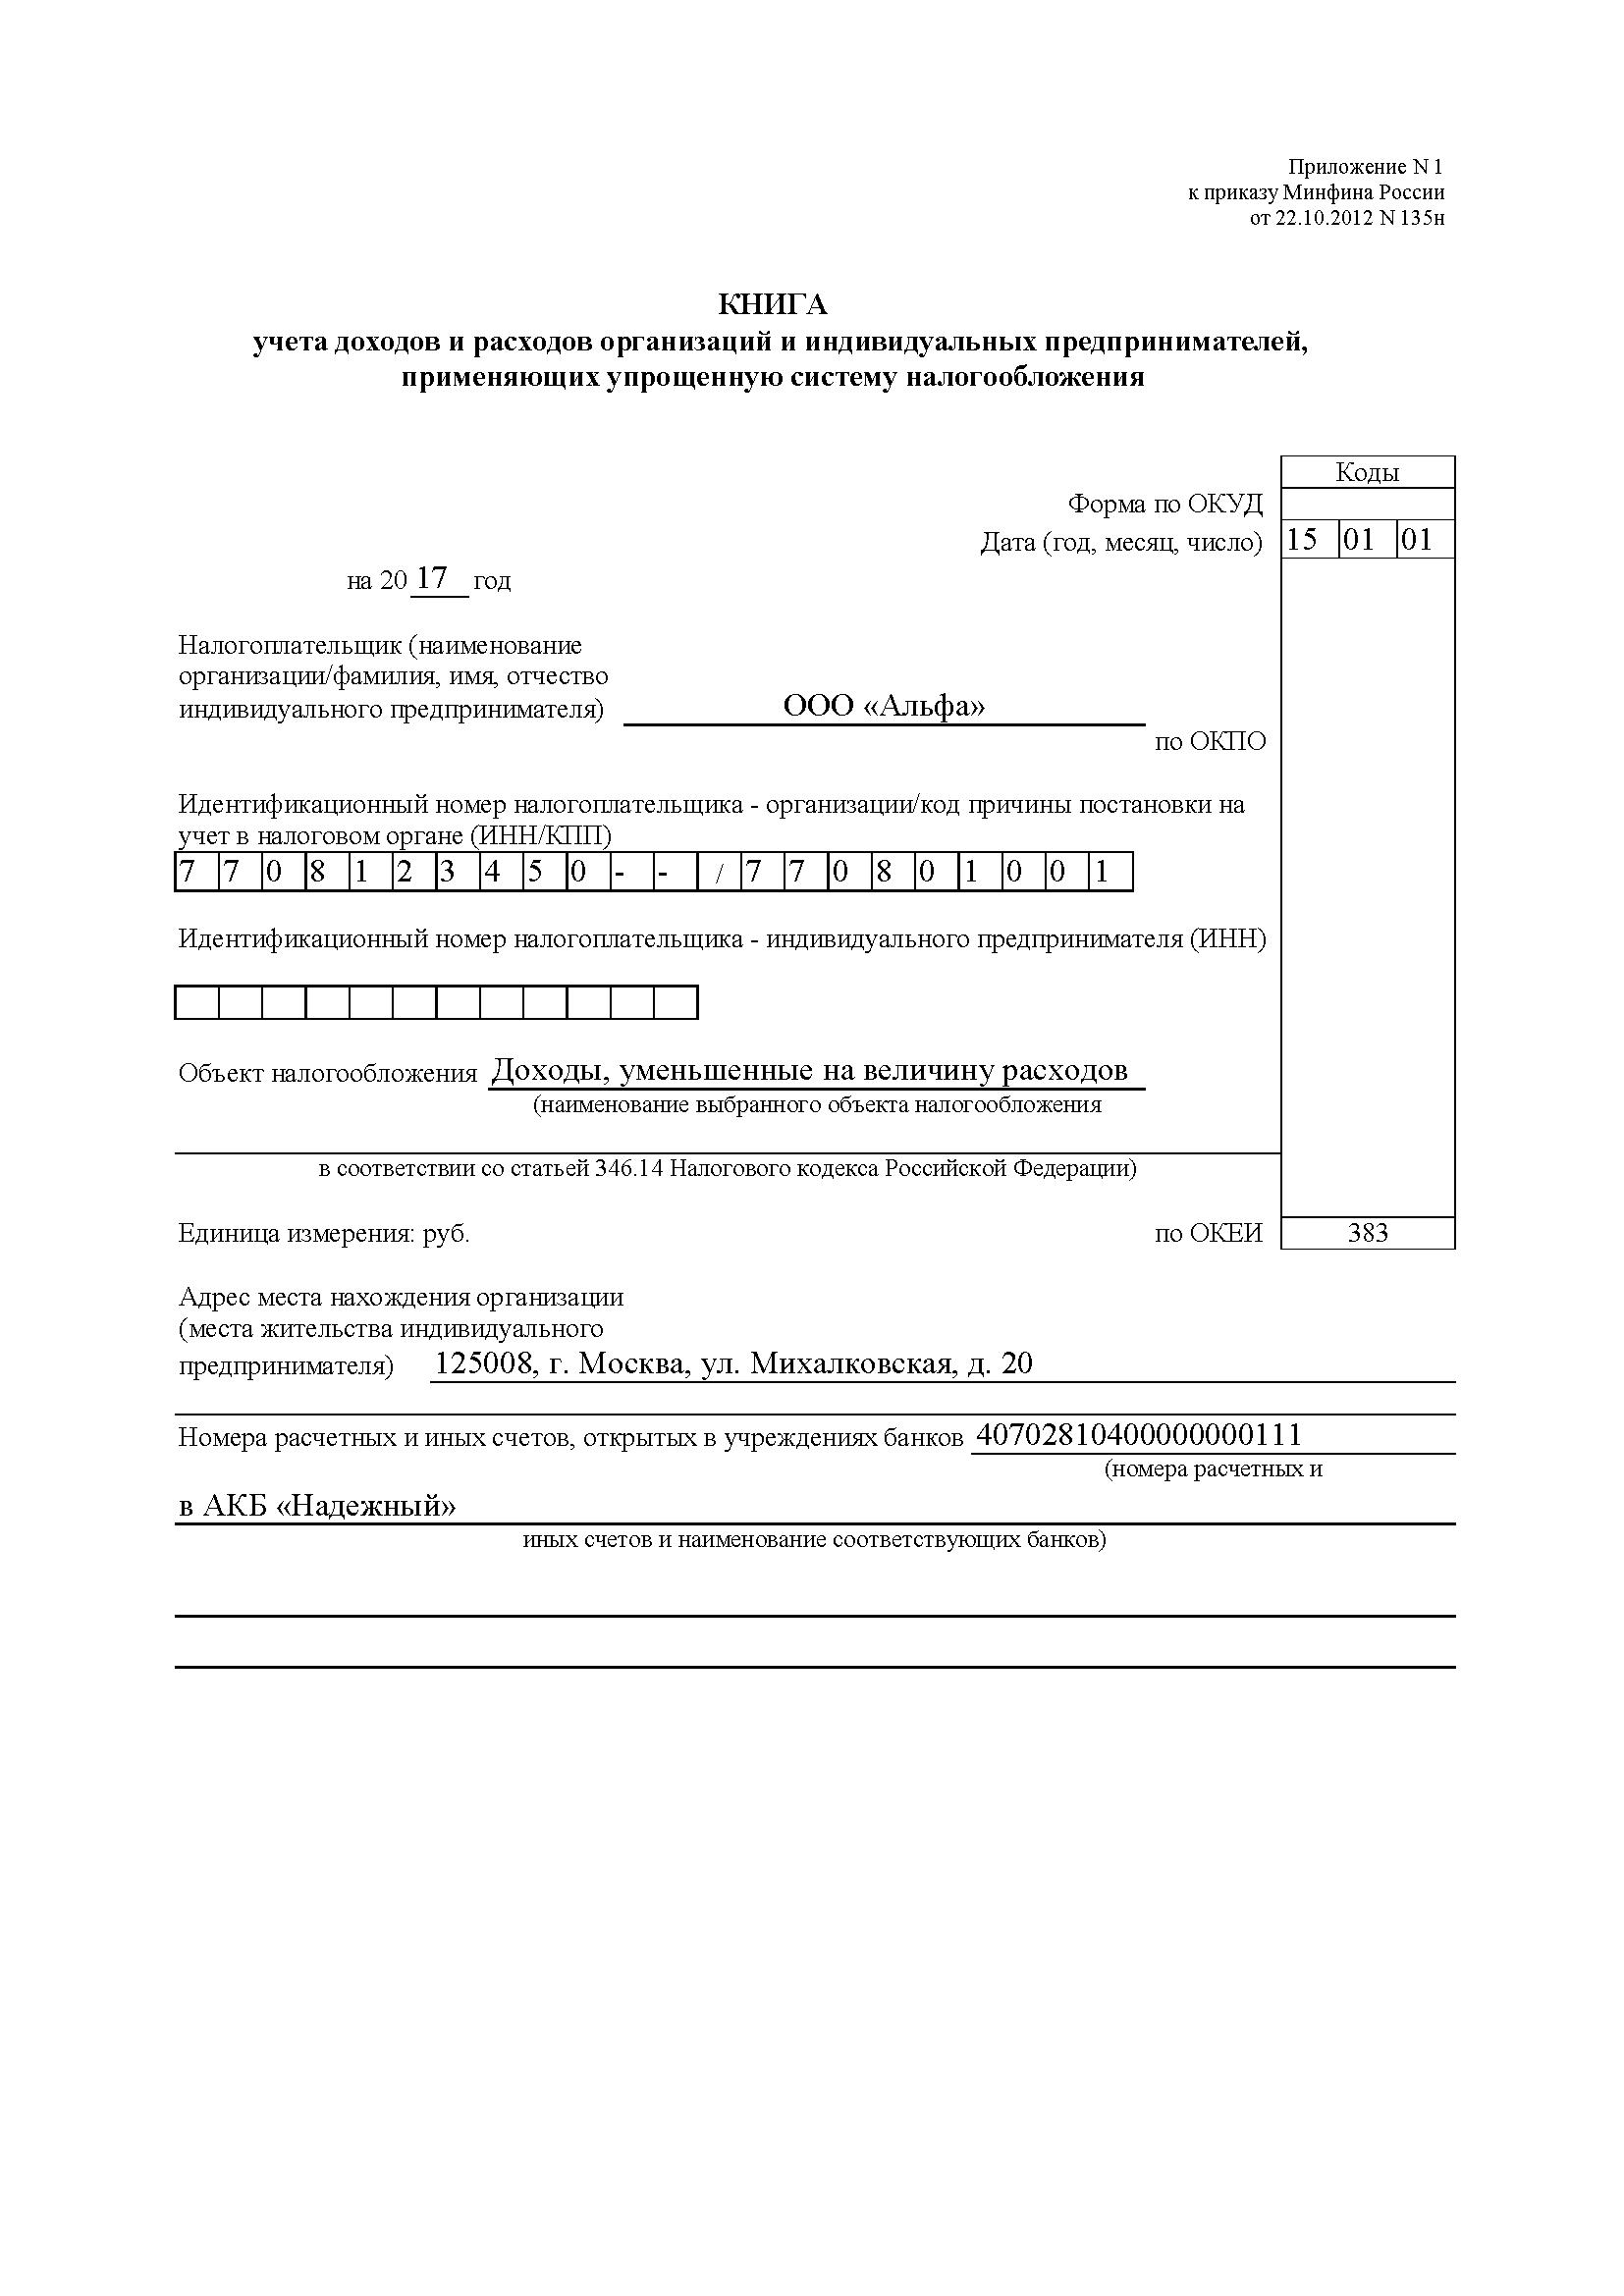 декларация ндс 2008 год бланк